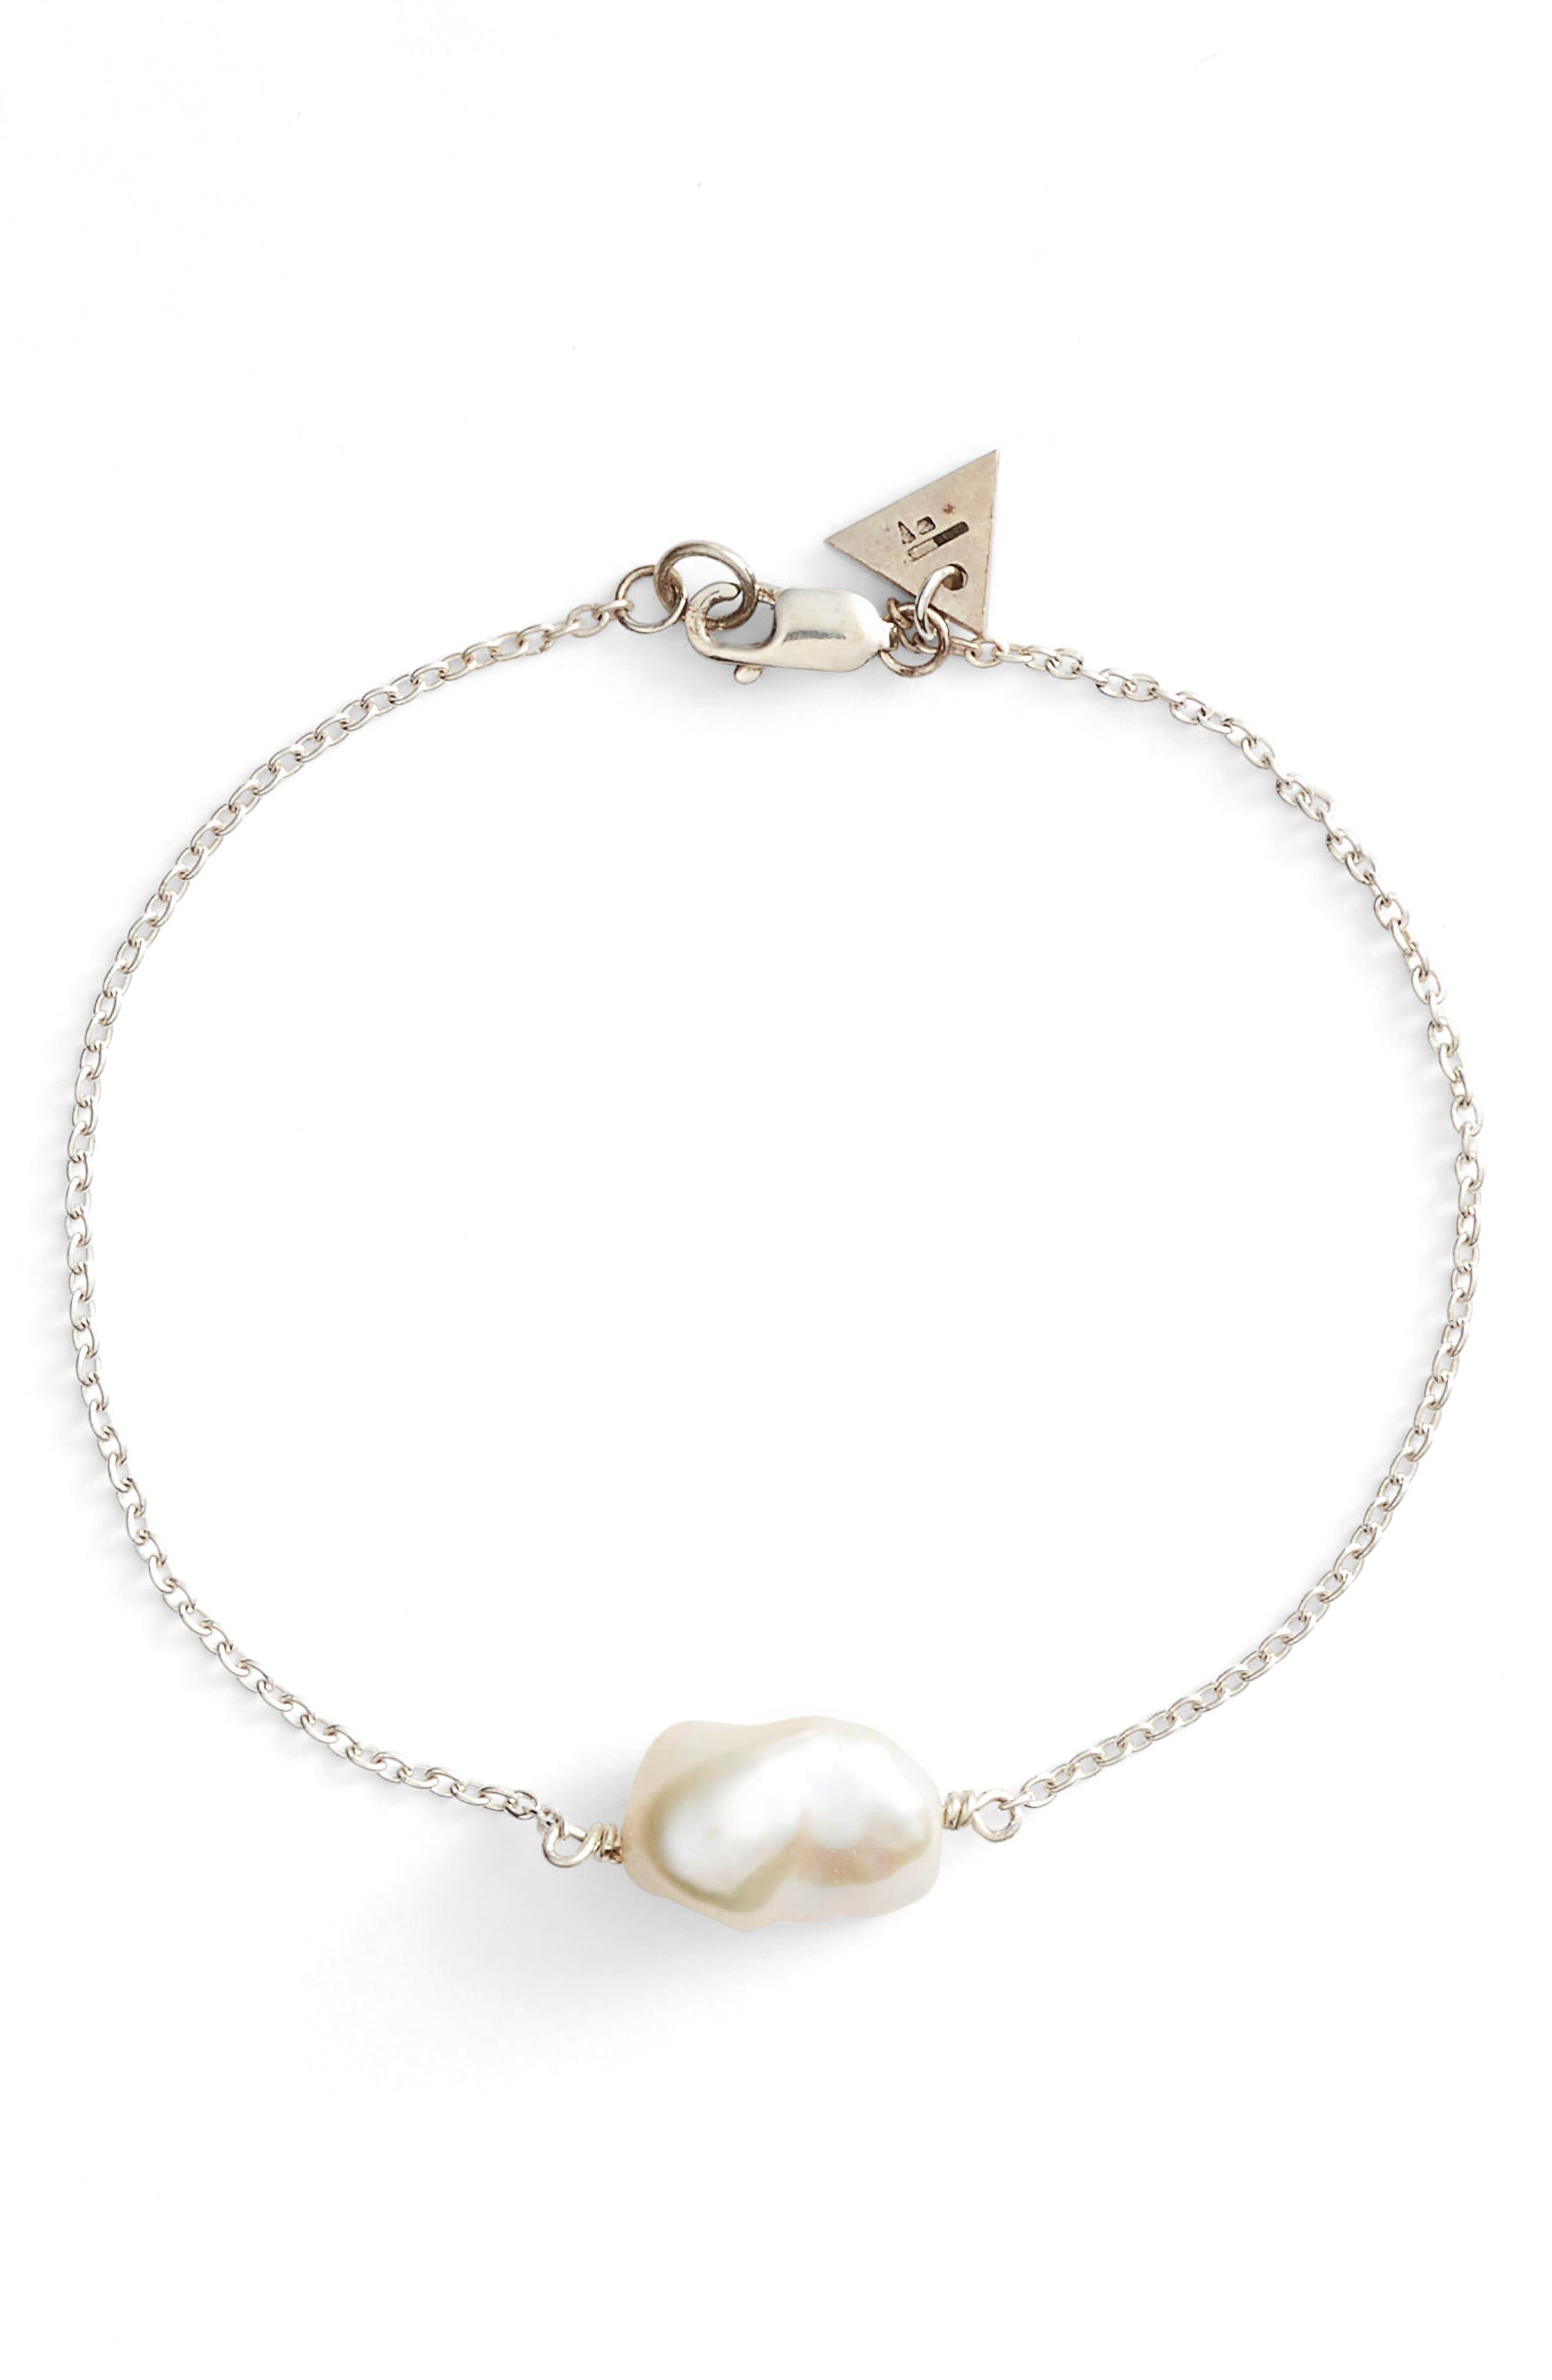 Keshi Cultured Pearl Bracelet,                             Main thumbnail 1, color,                             041